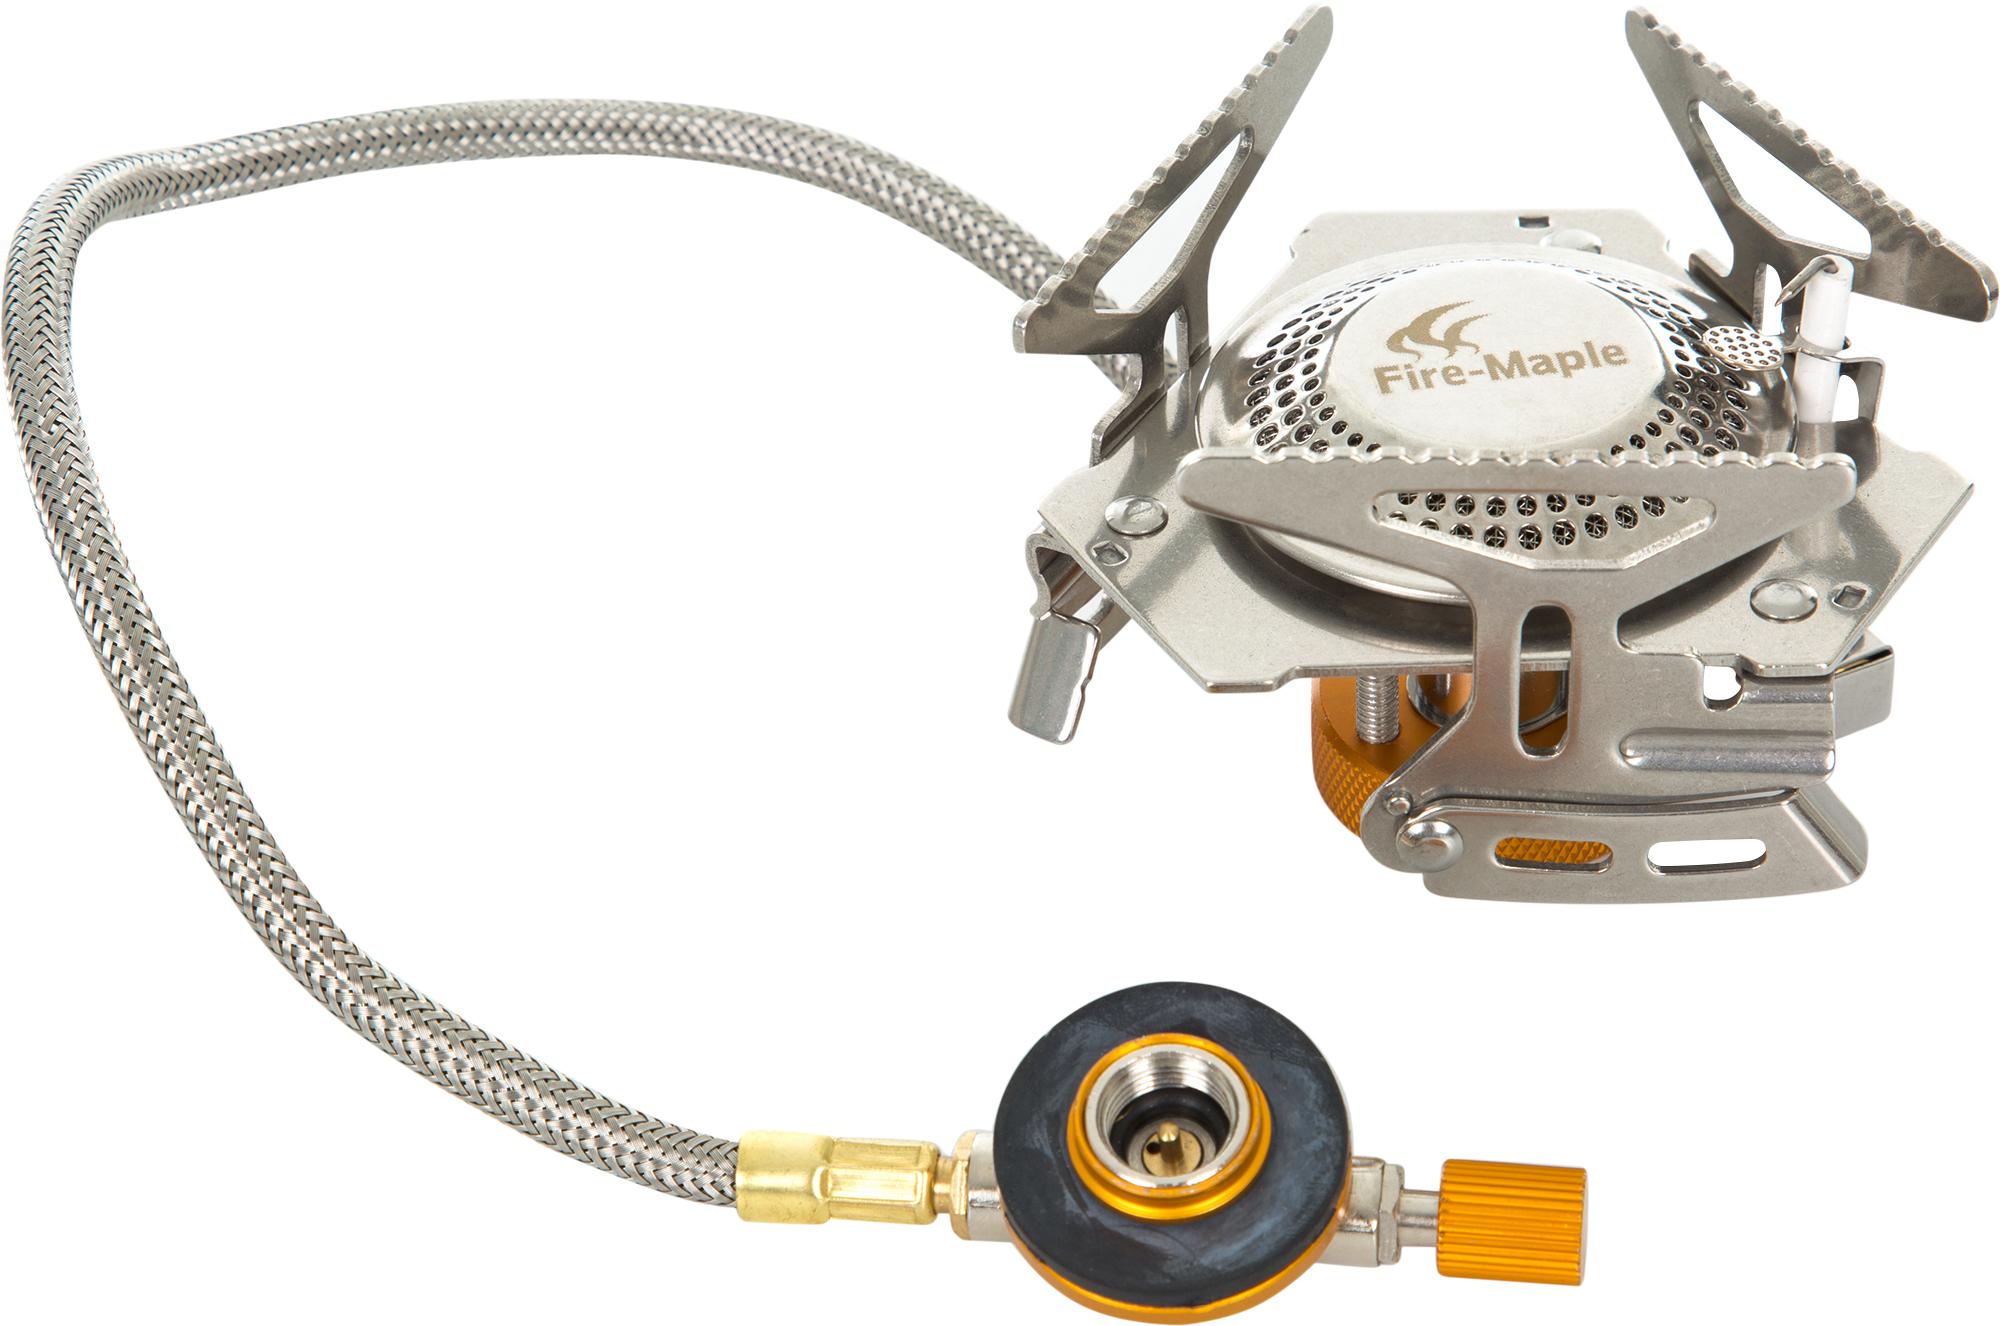 Fire-Maple Газовая горелка Fire-Maple FMS-105